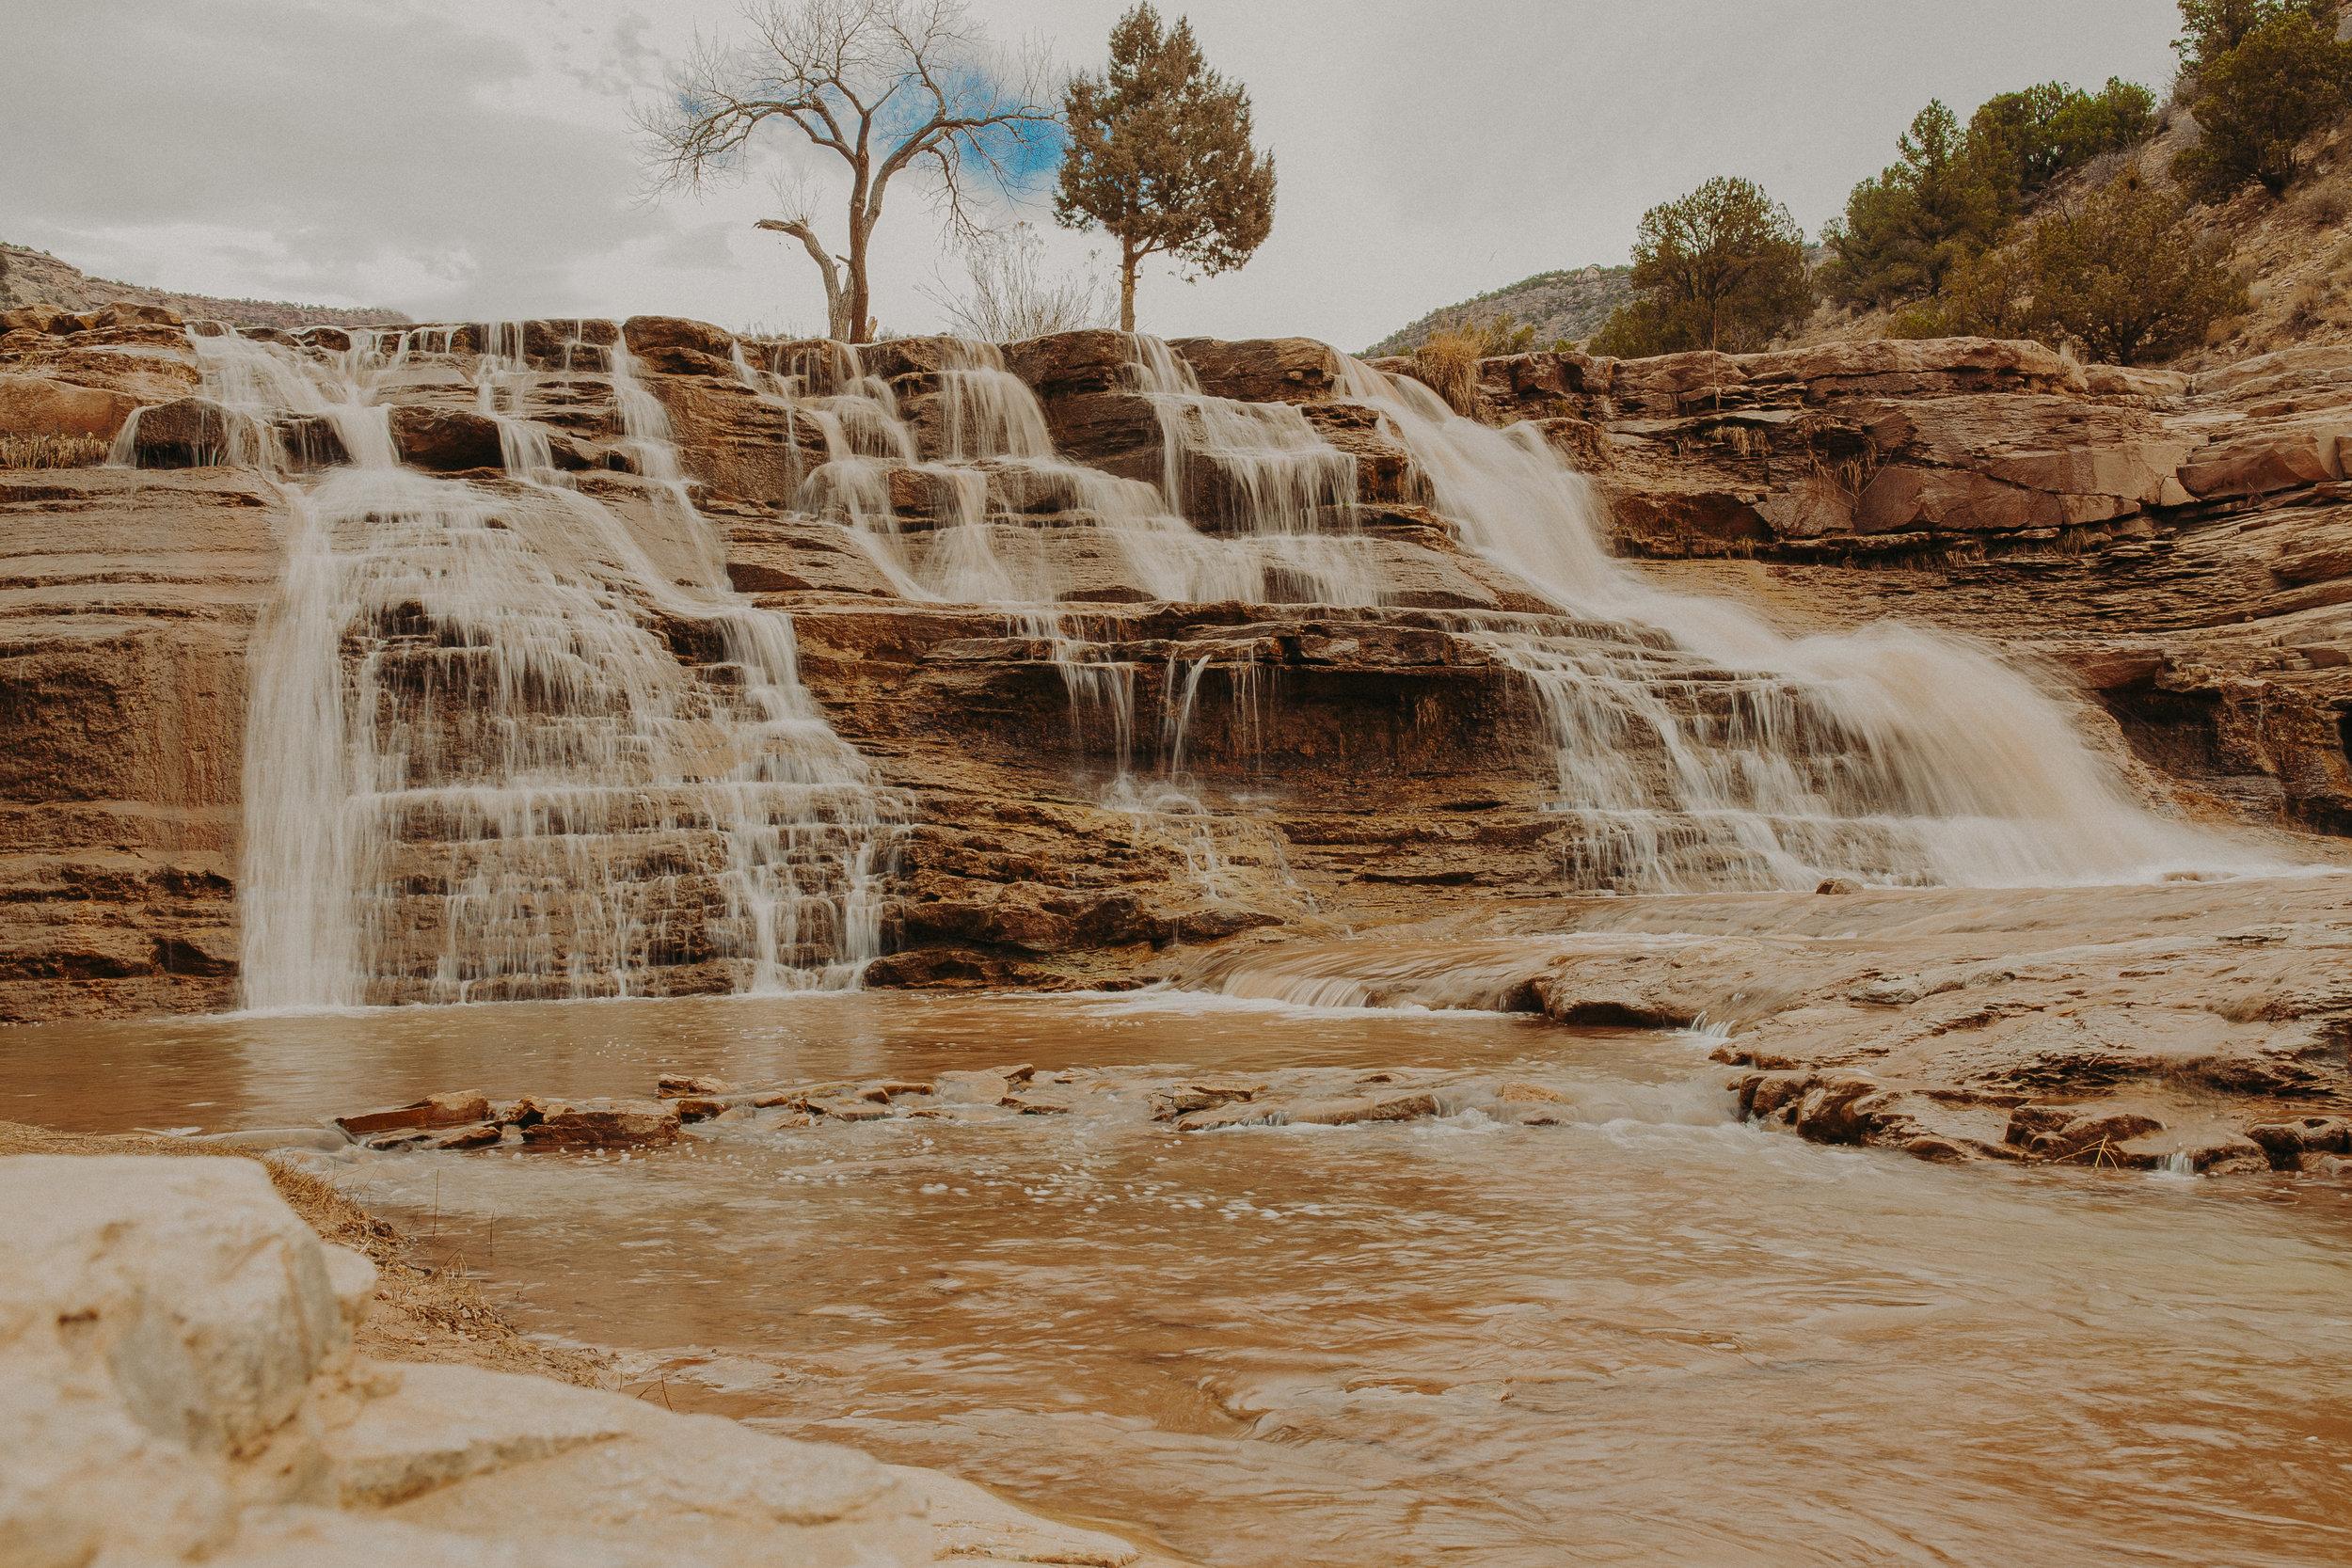 Toquerville-Falls-Southern-Utah-Waterfalls-3.jpg